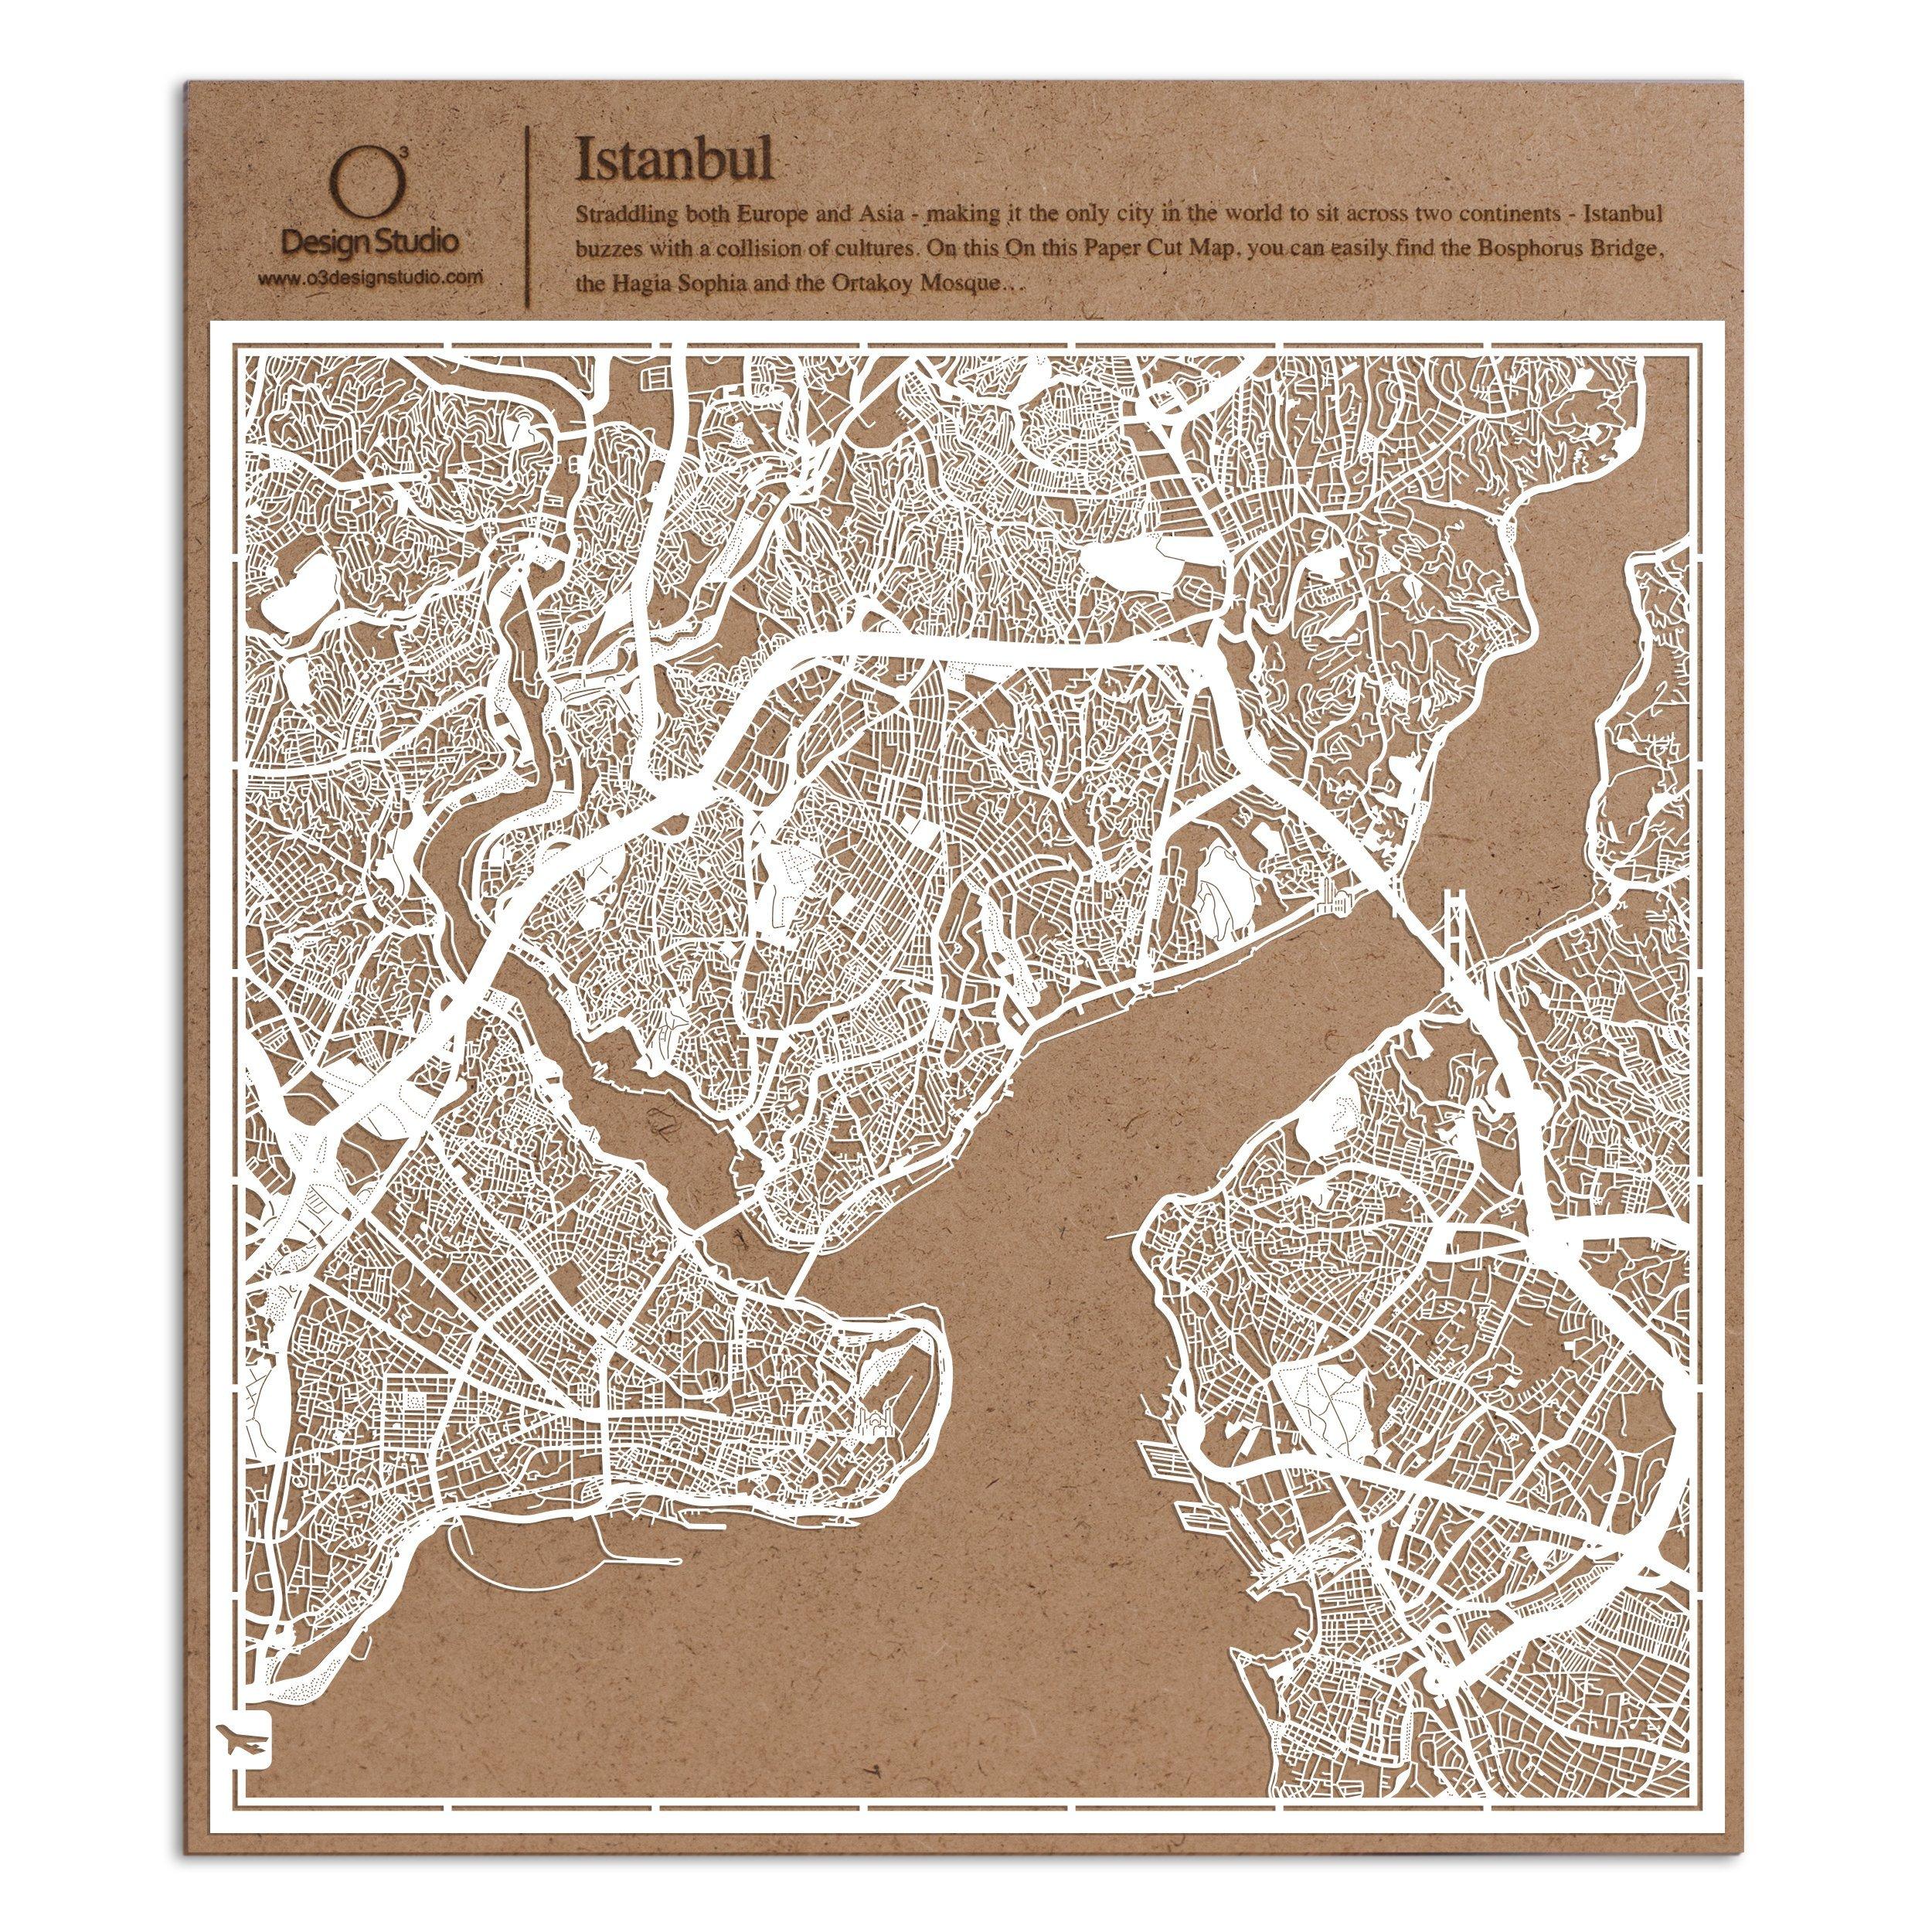 Istanbul Paper Cut Map by O3 Design Studio White 12x12 inches Paper Art